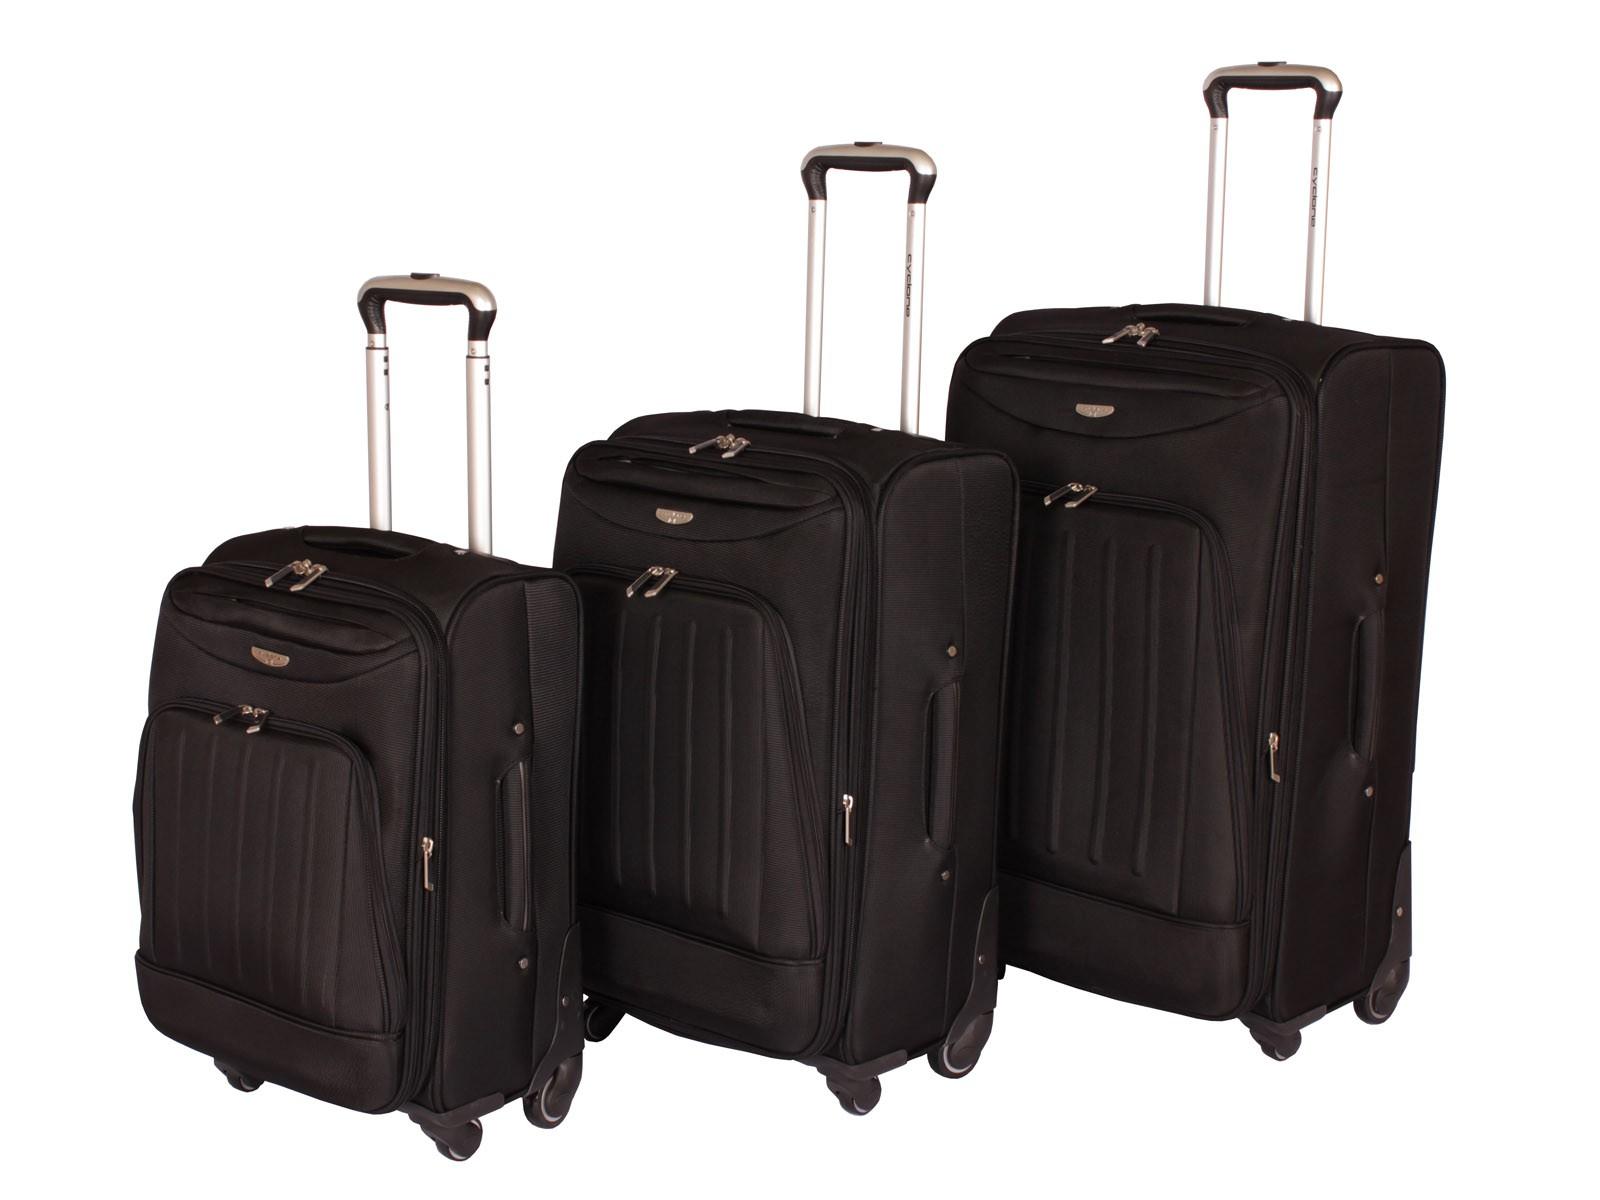 "Cyclone Flo 4 Wheel Luggage Set of 3 ( 20"" / 24"" / 28"" ) Black"